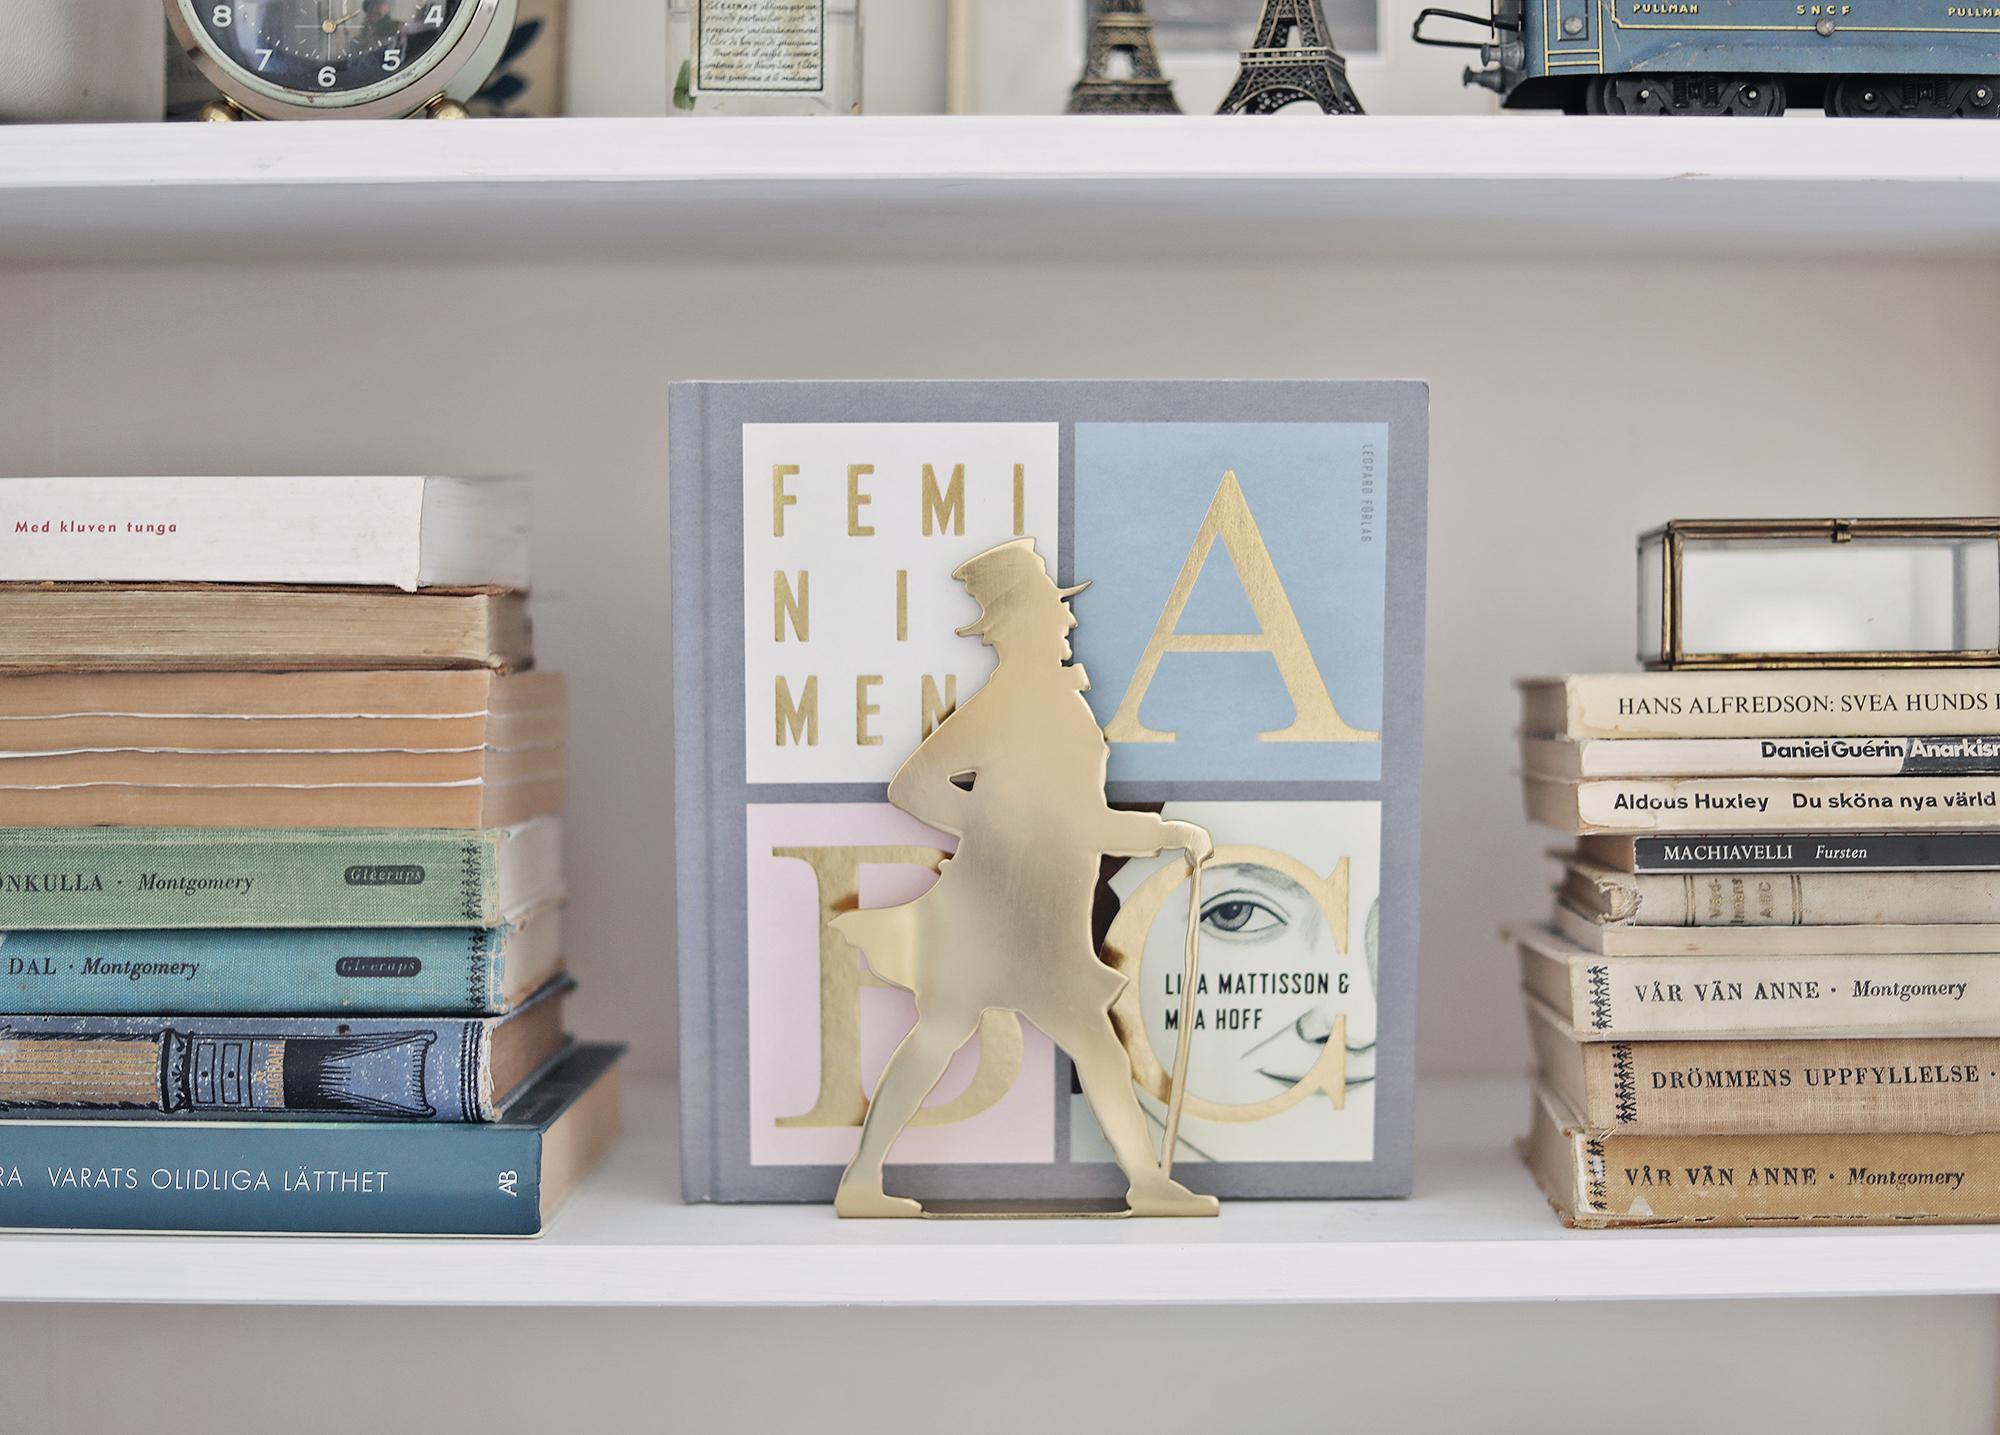 bokhylla bookshelf inredning interior books vintage Paris emmasvintage farbror blå Elsa beskow